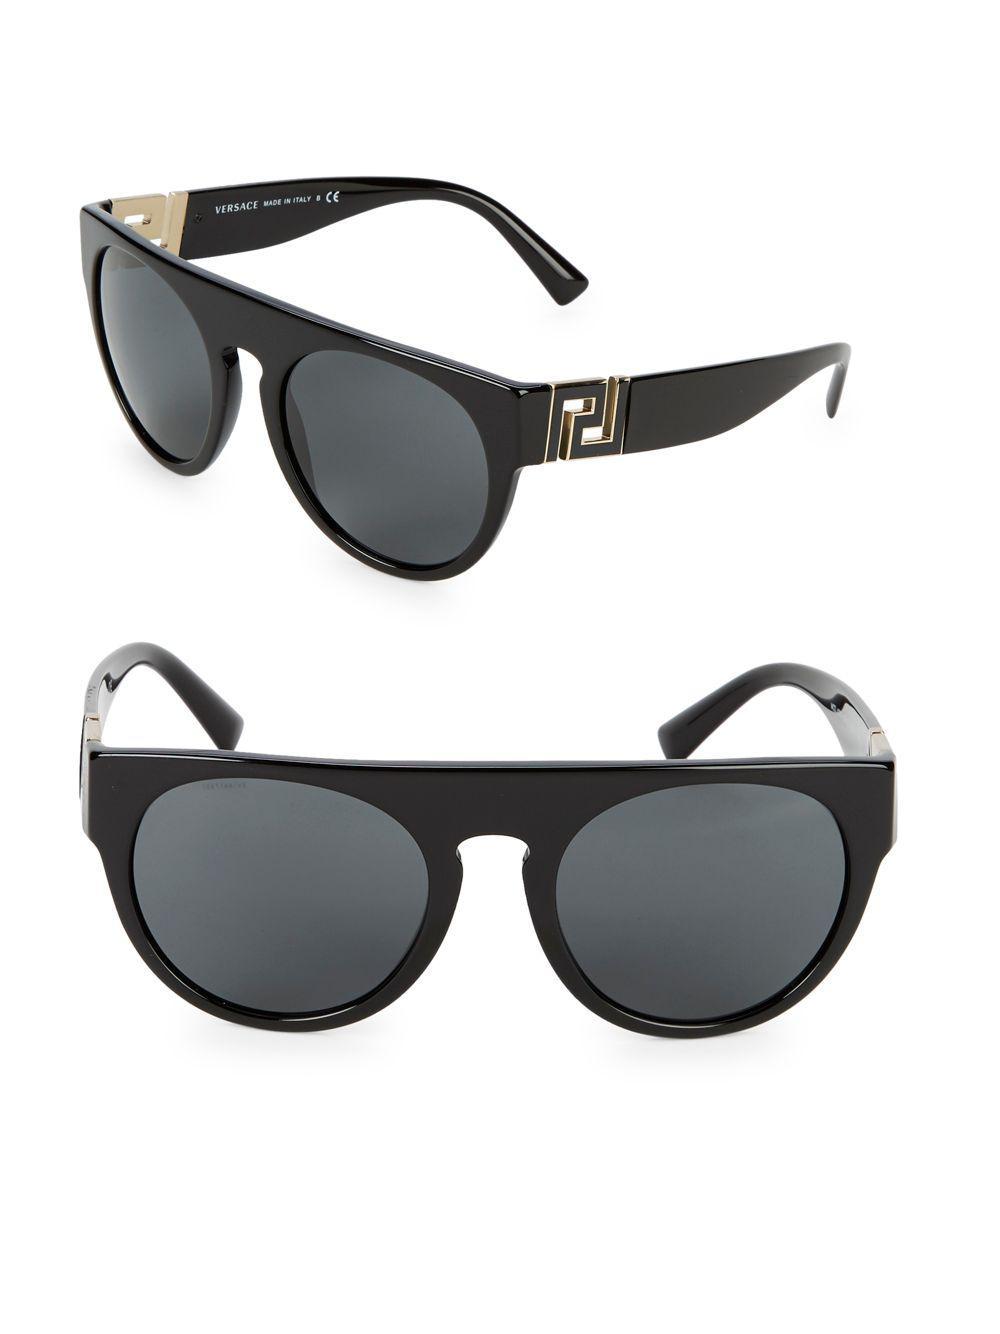 8c82733341bb Versace 55mm Round Sunglasses in Black - Lyst